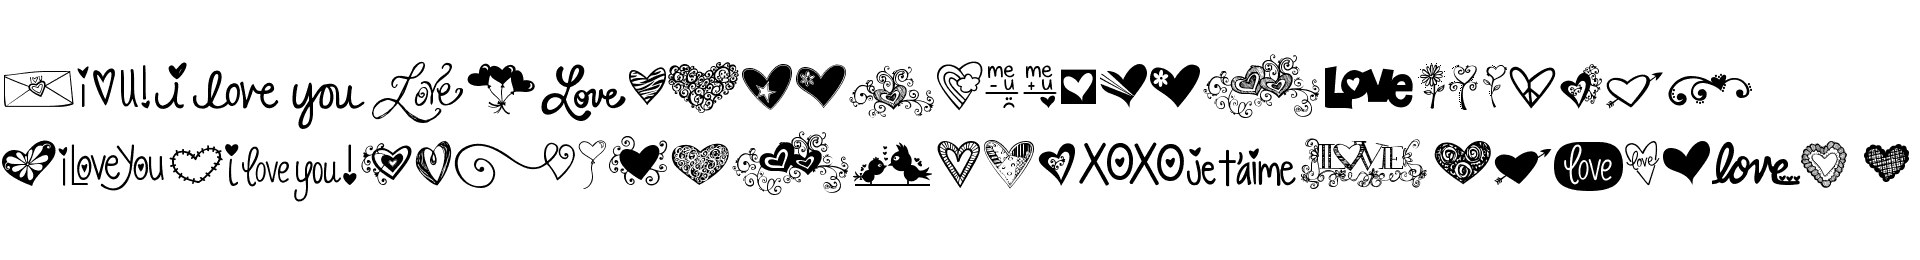 KG Heart Doodles